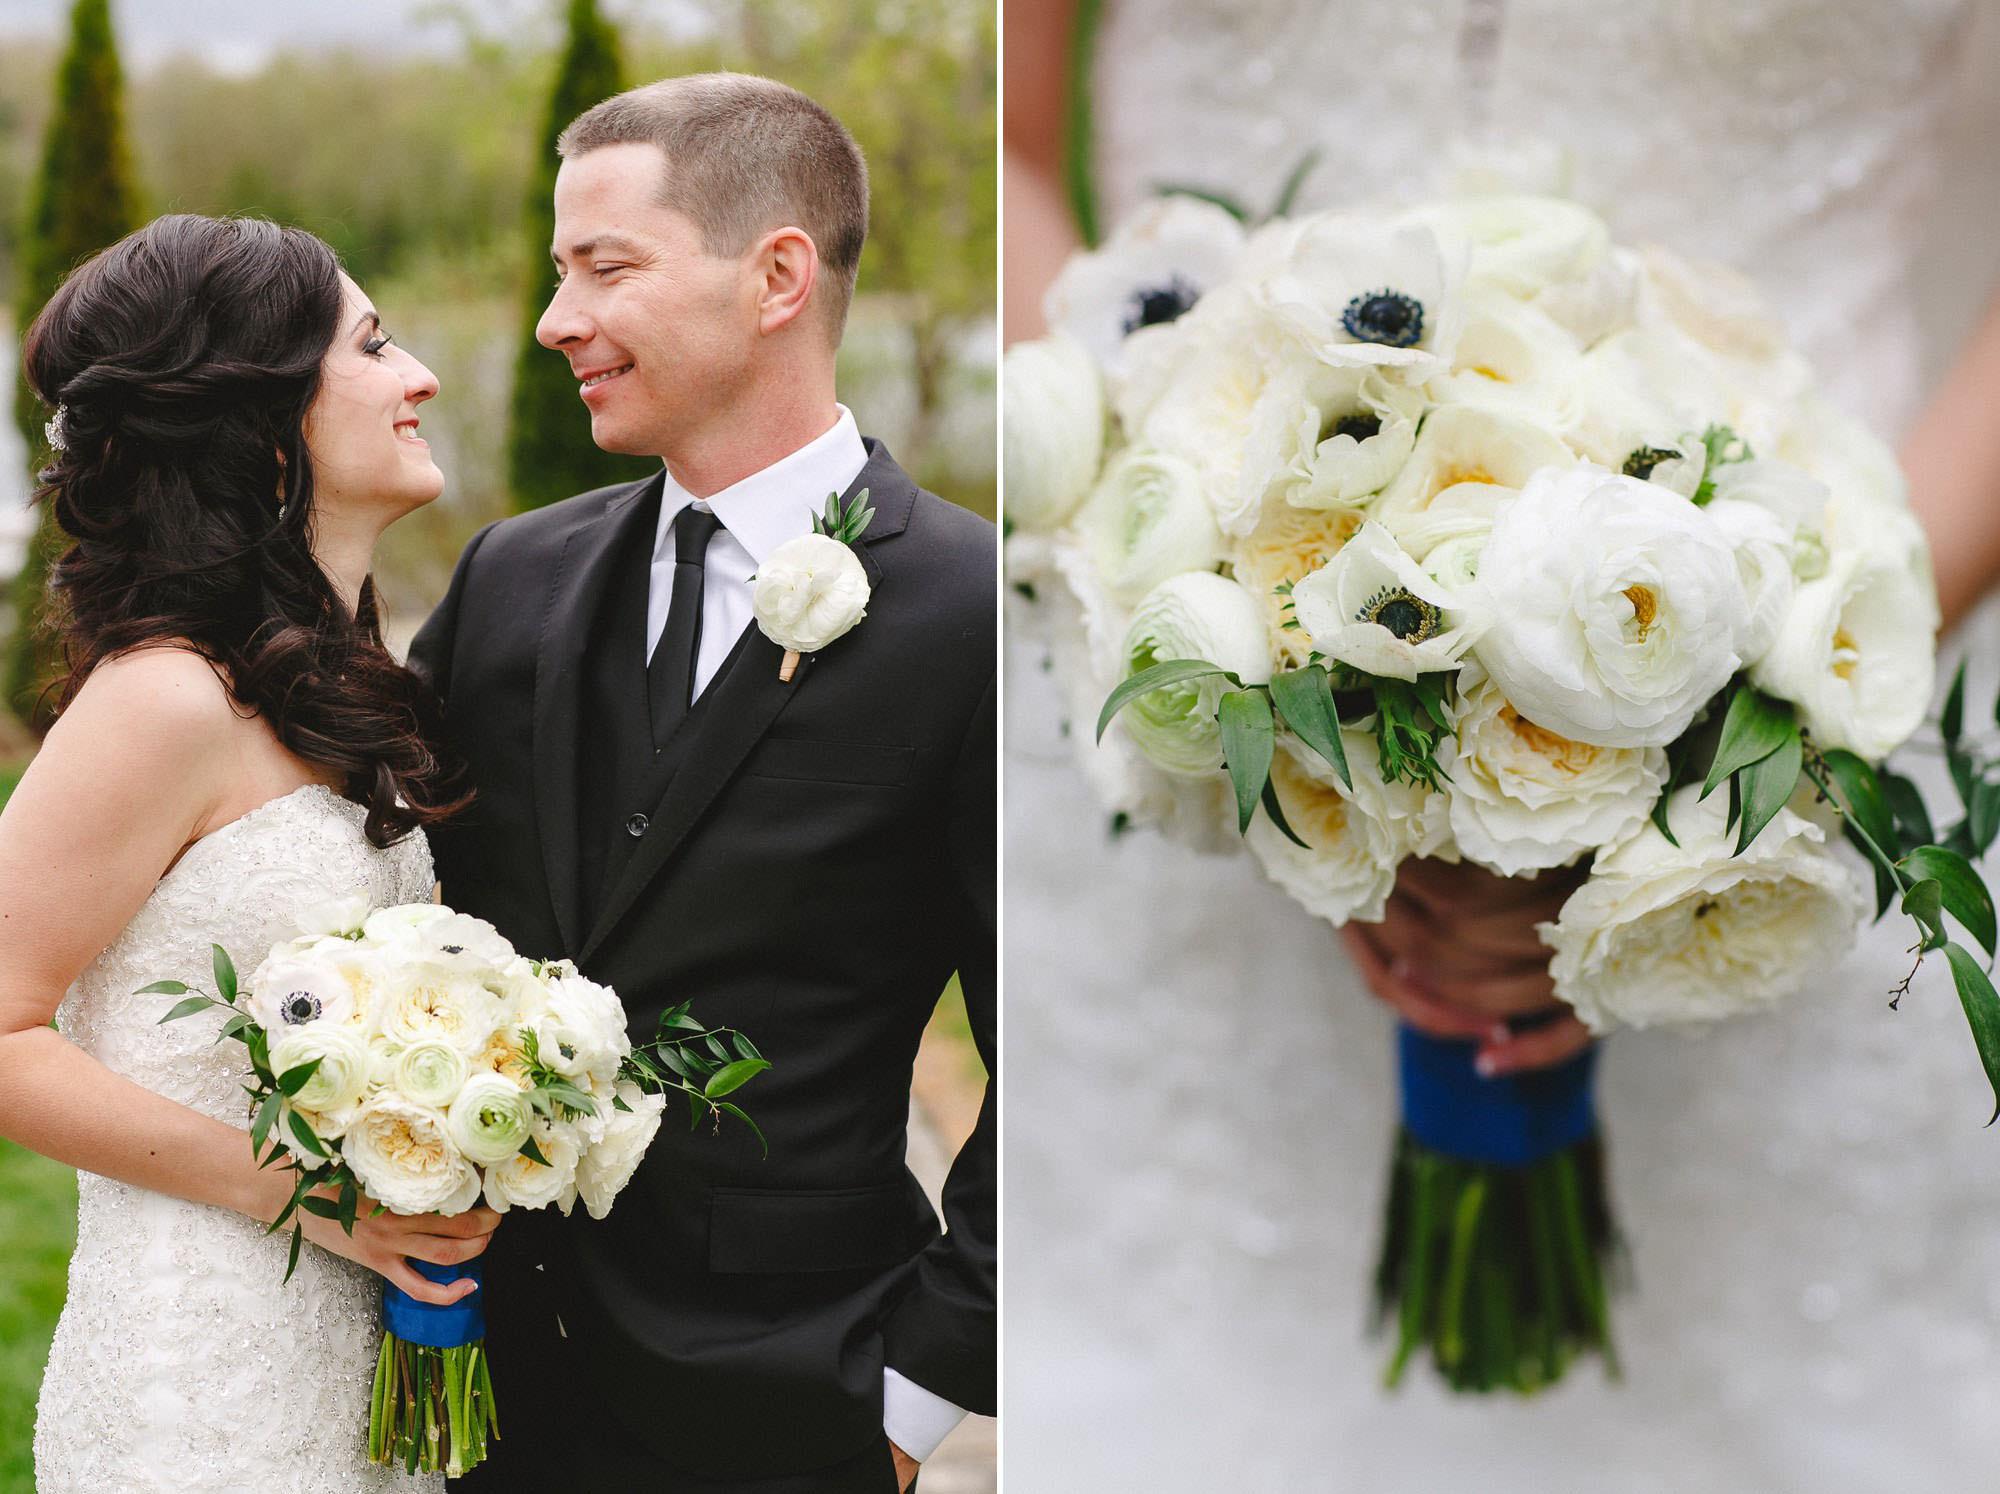 michigan-backyard-wedding051432.jpg